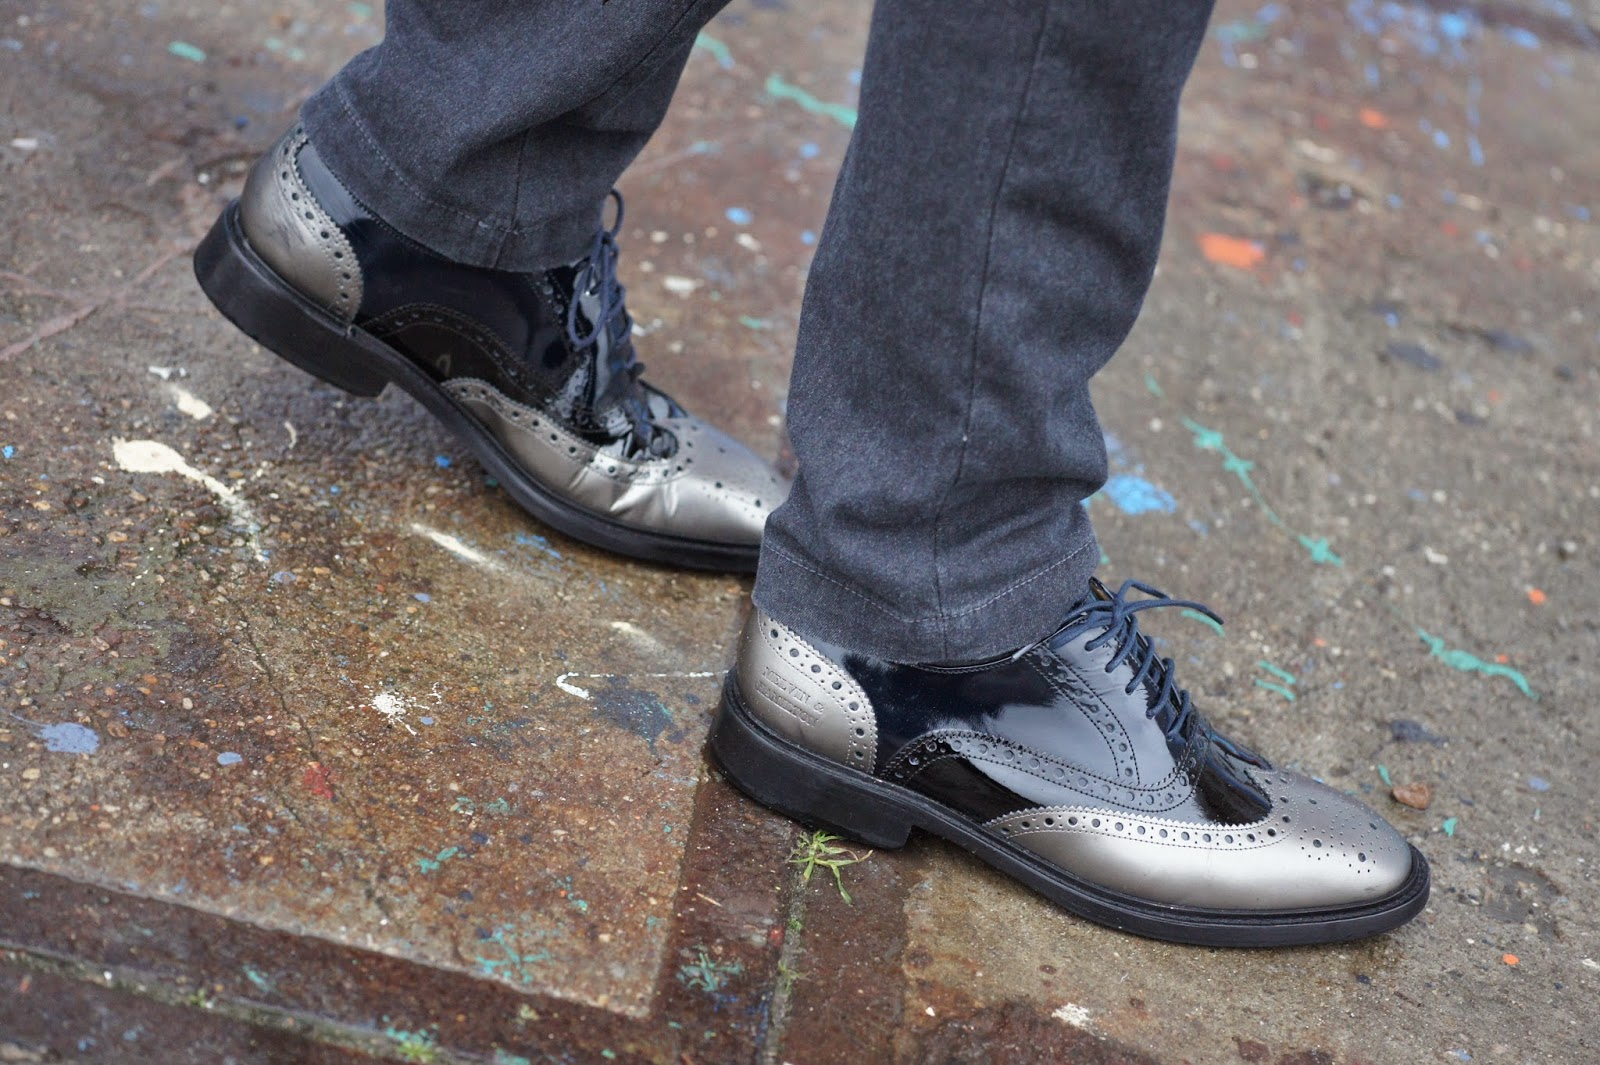 Dapper Hot Boy with melvin & hamilton brogue shoes